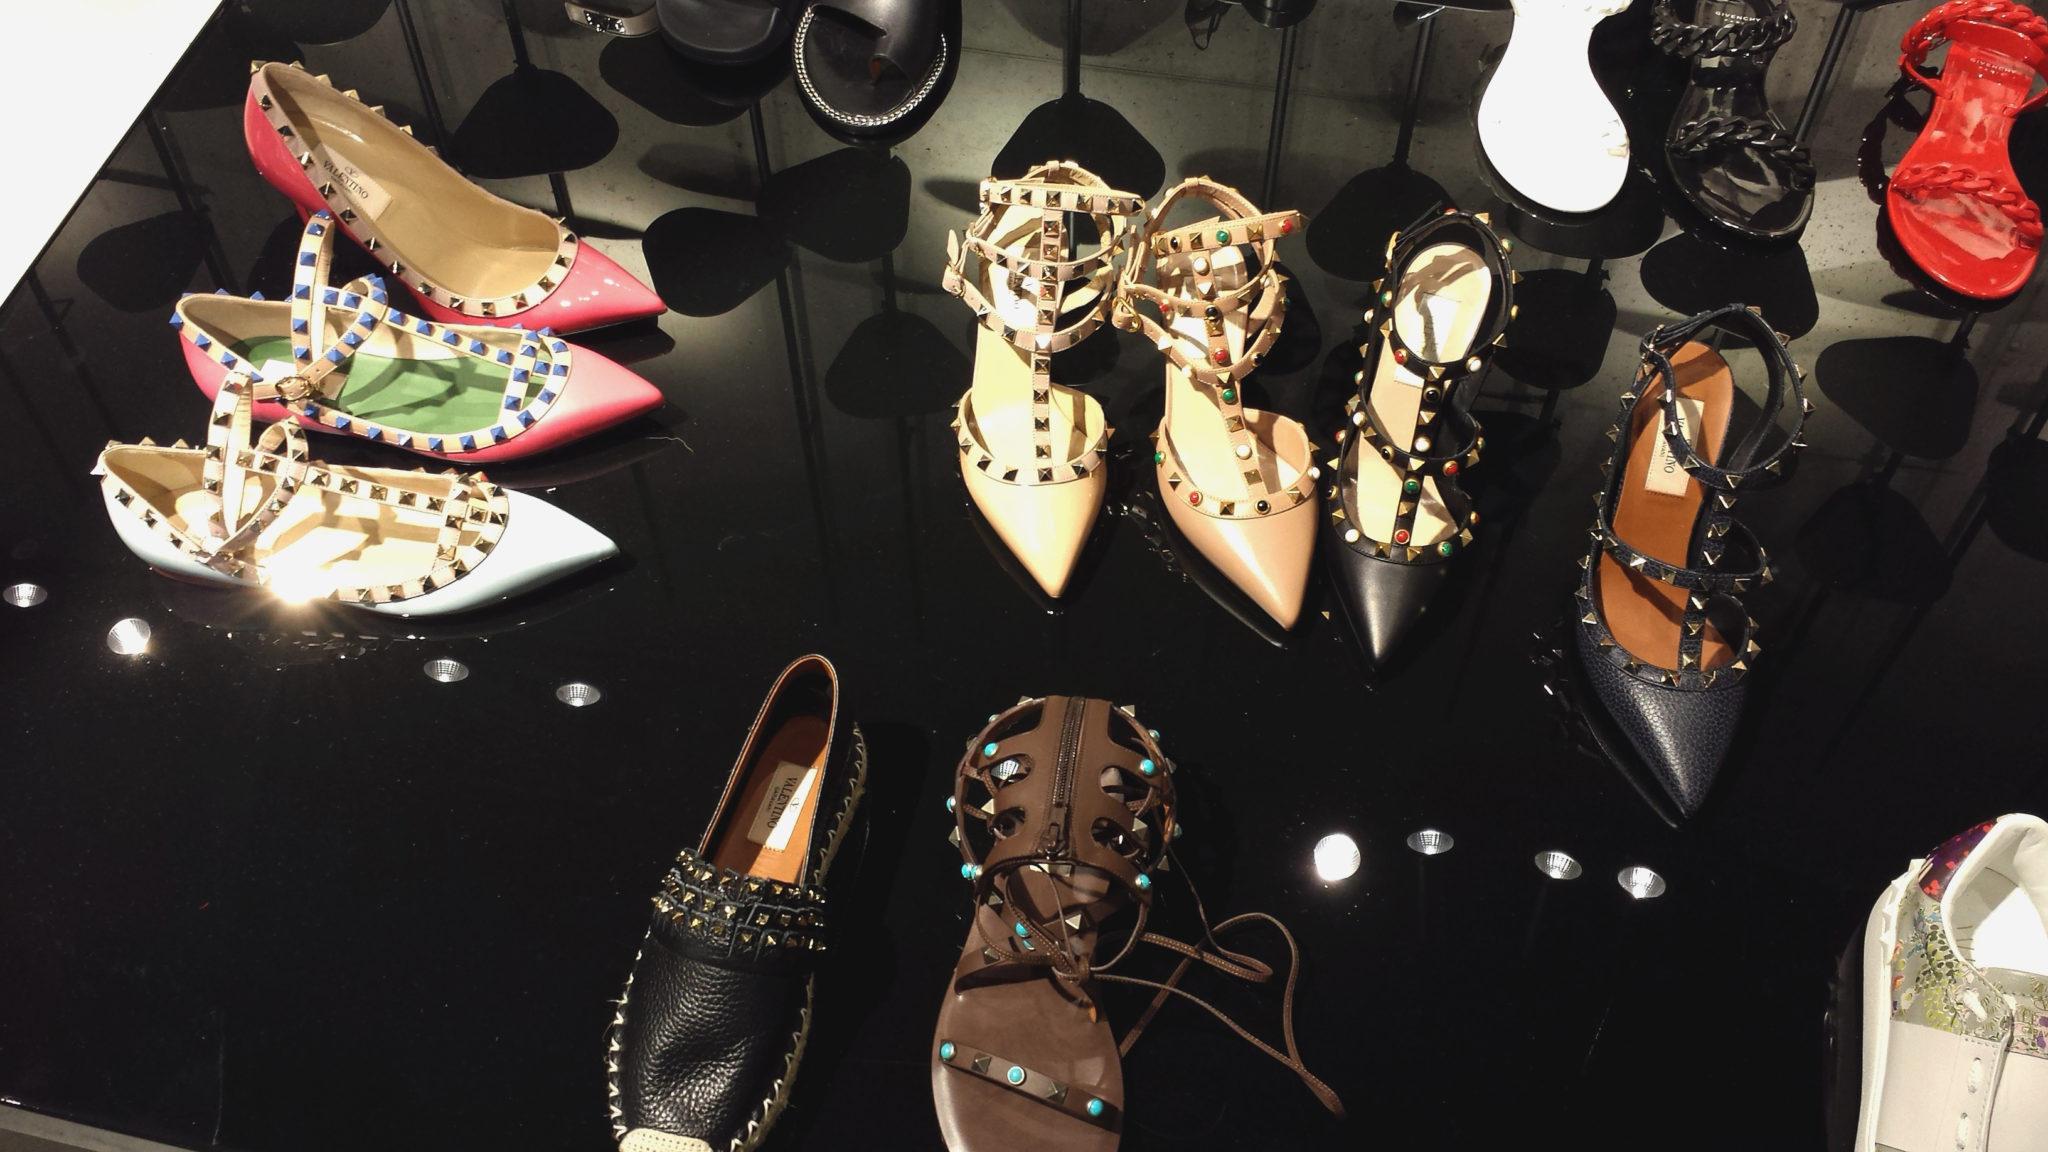 Hema_Bruxelles_bonnes_adresses_shopping_fashion_smets_valentino_rockstud